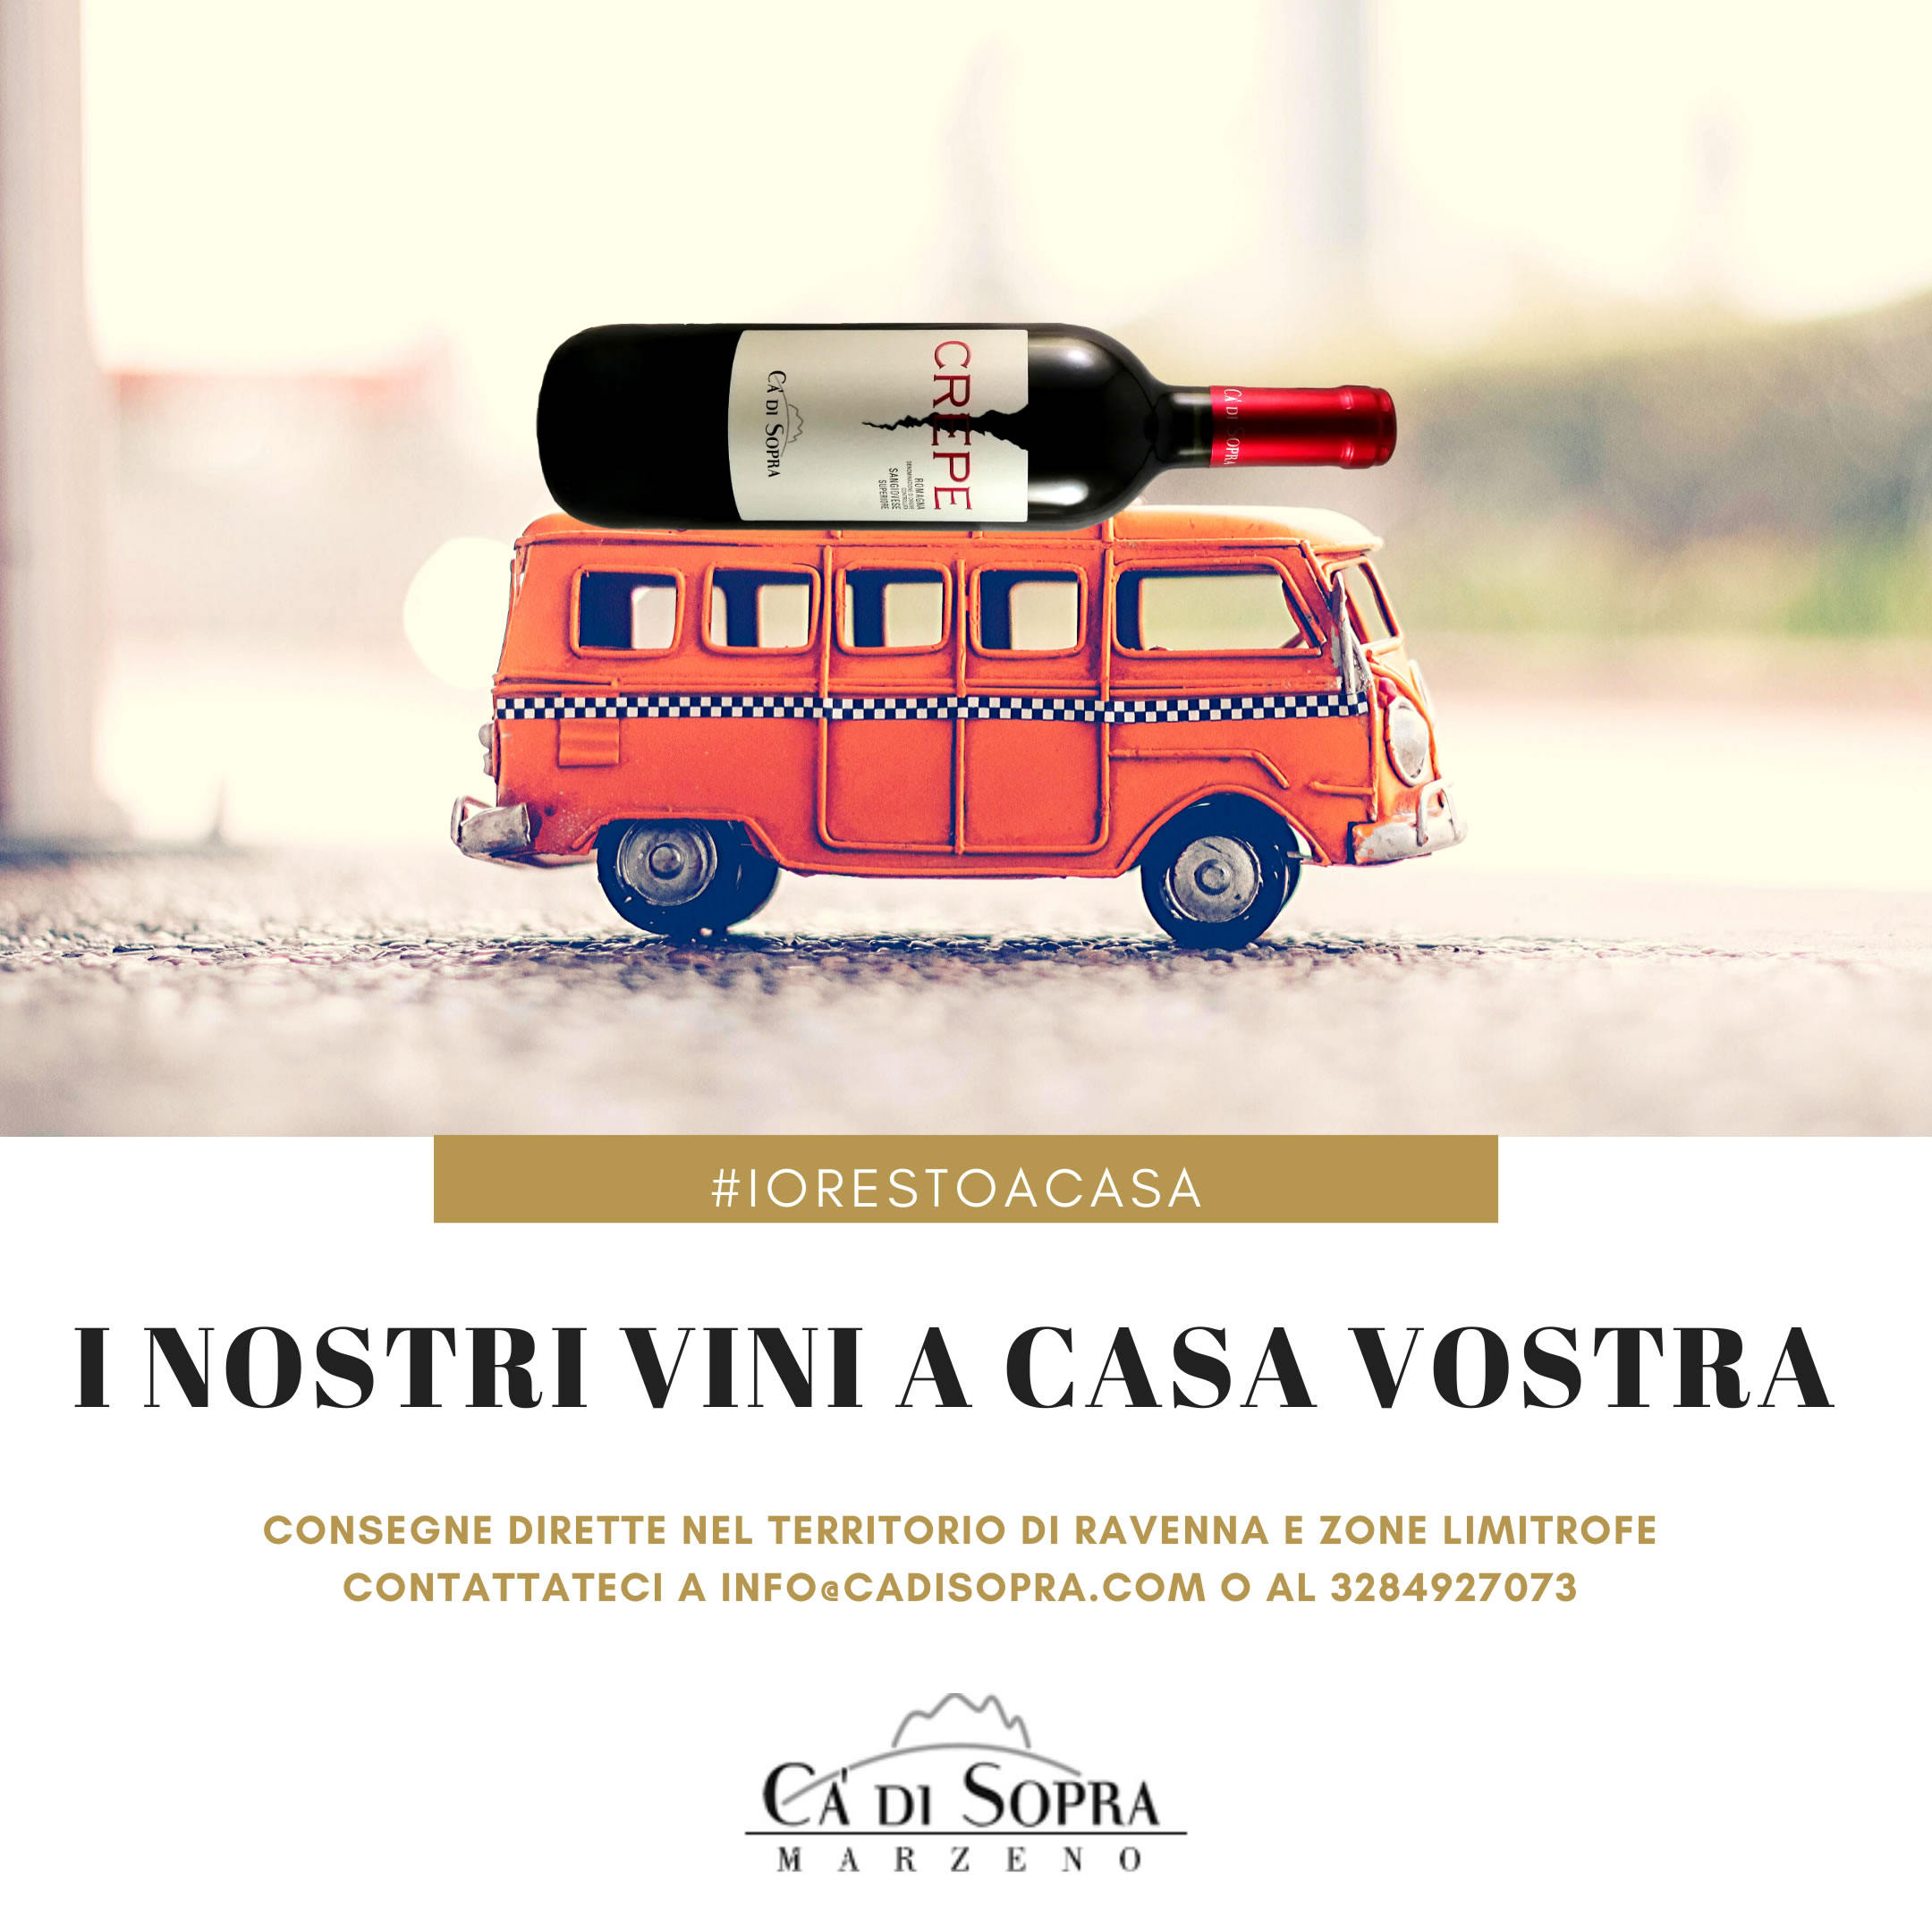 #IORESTOACASA: I NOSTRI VINI A CASA VOSTRA